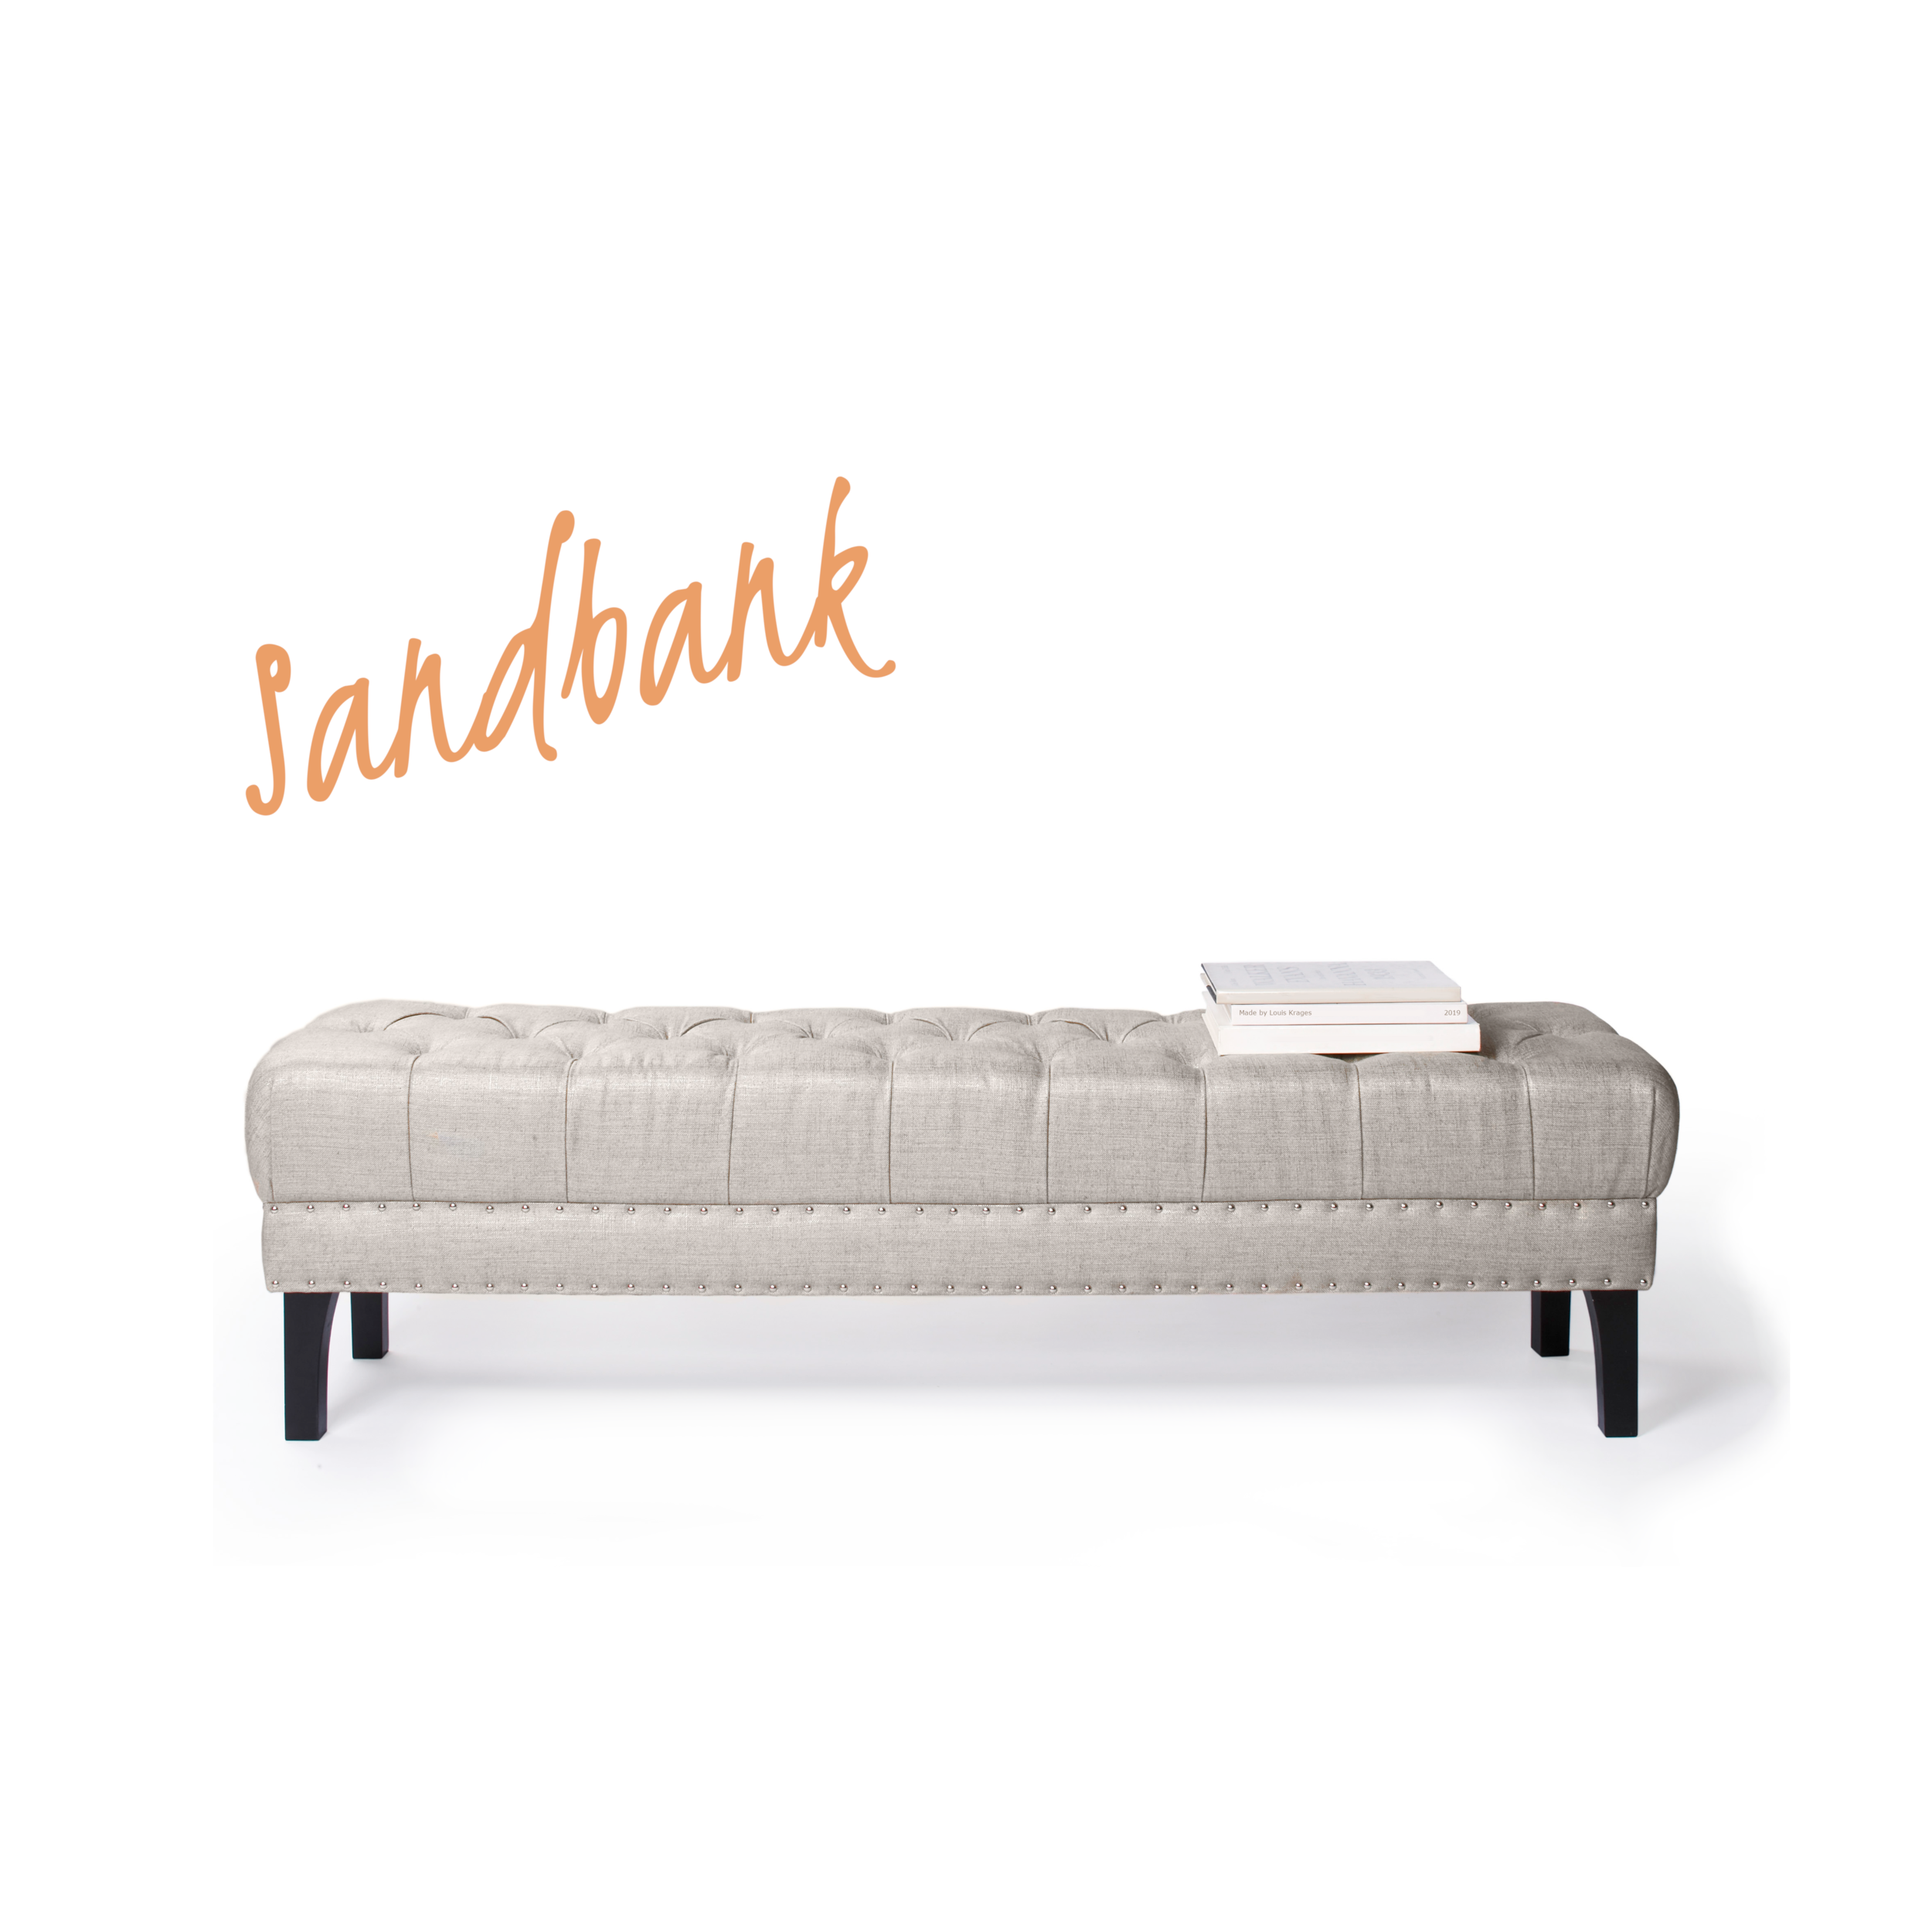 BettBank_Sandbank.png